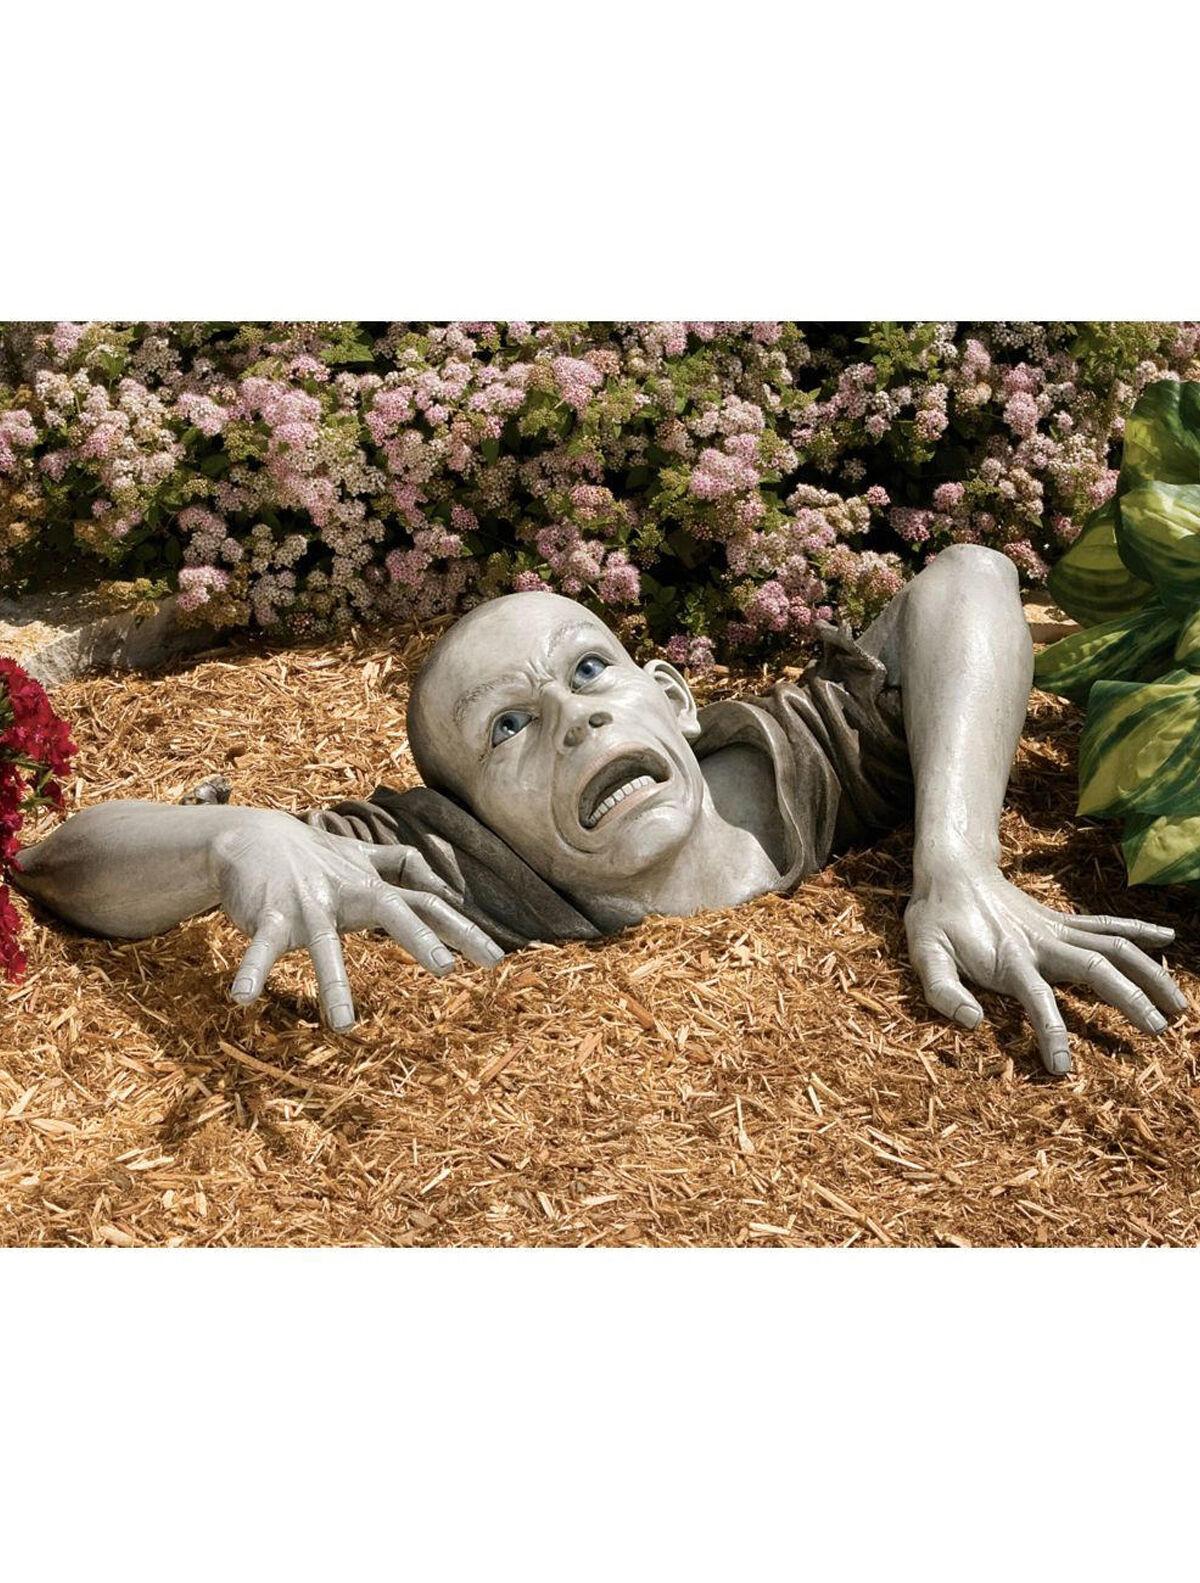 Sly Fox Garden Statue Made in the USA Gardenerscom